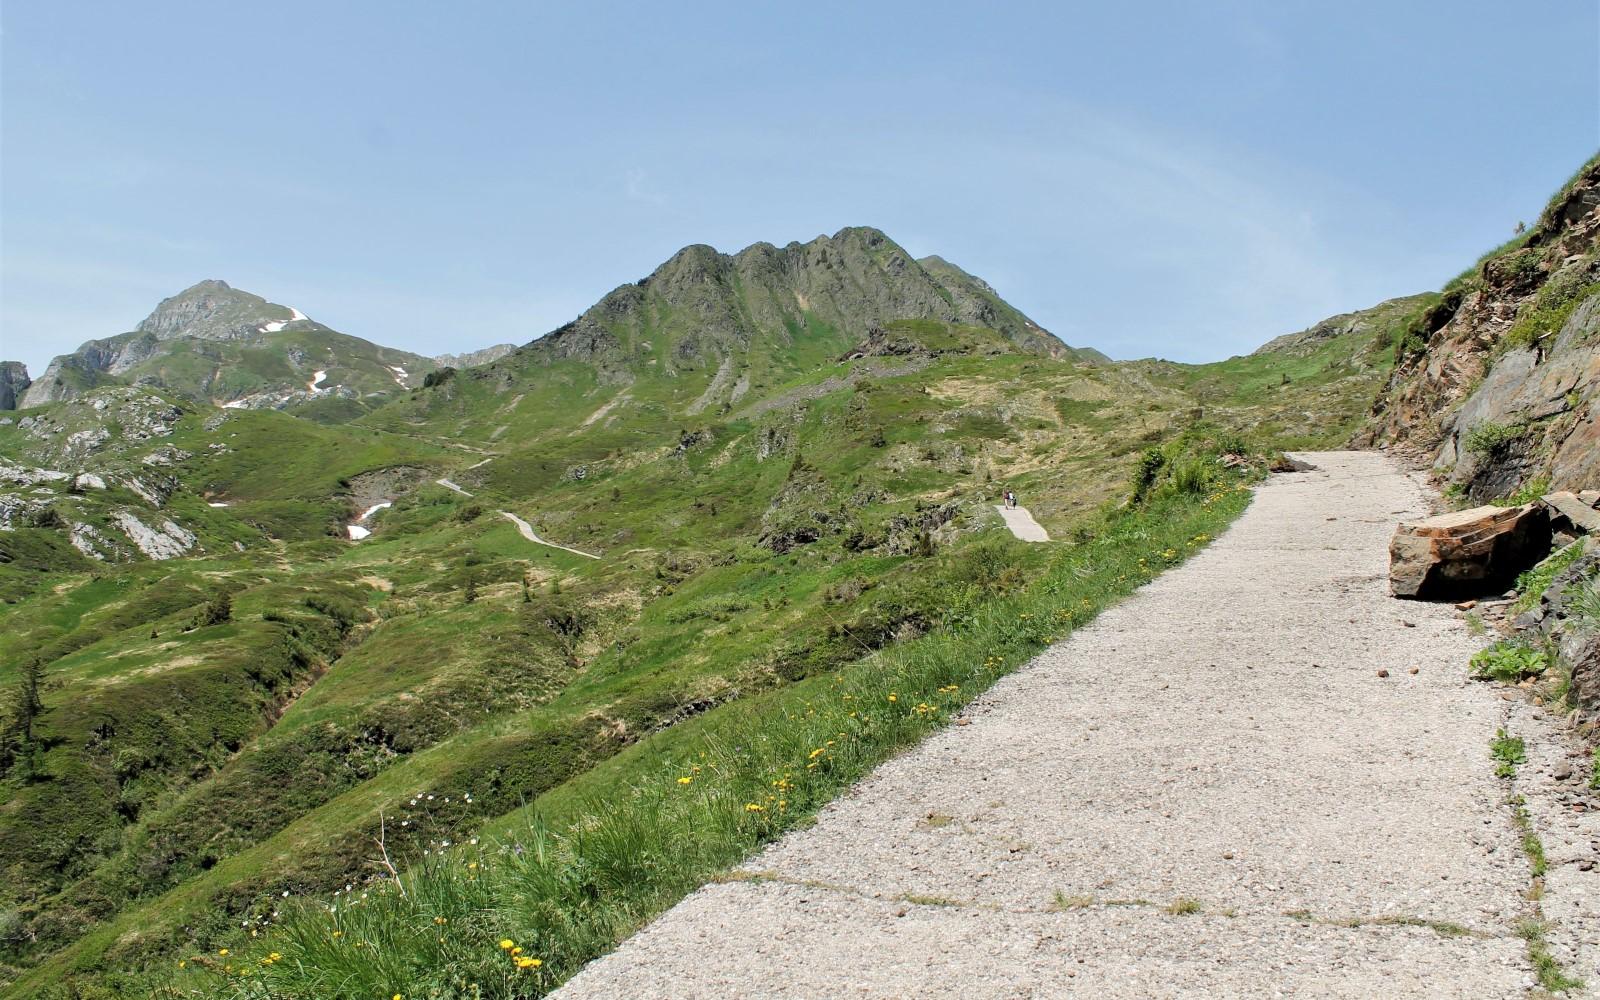 Wandelpad CAI 402 in de Karnische Alpen